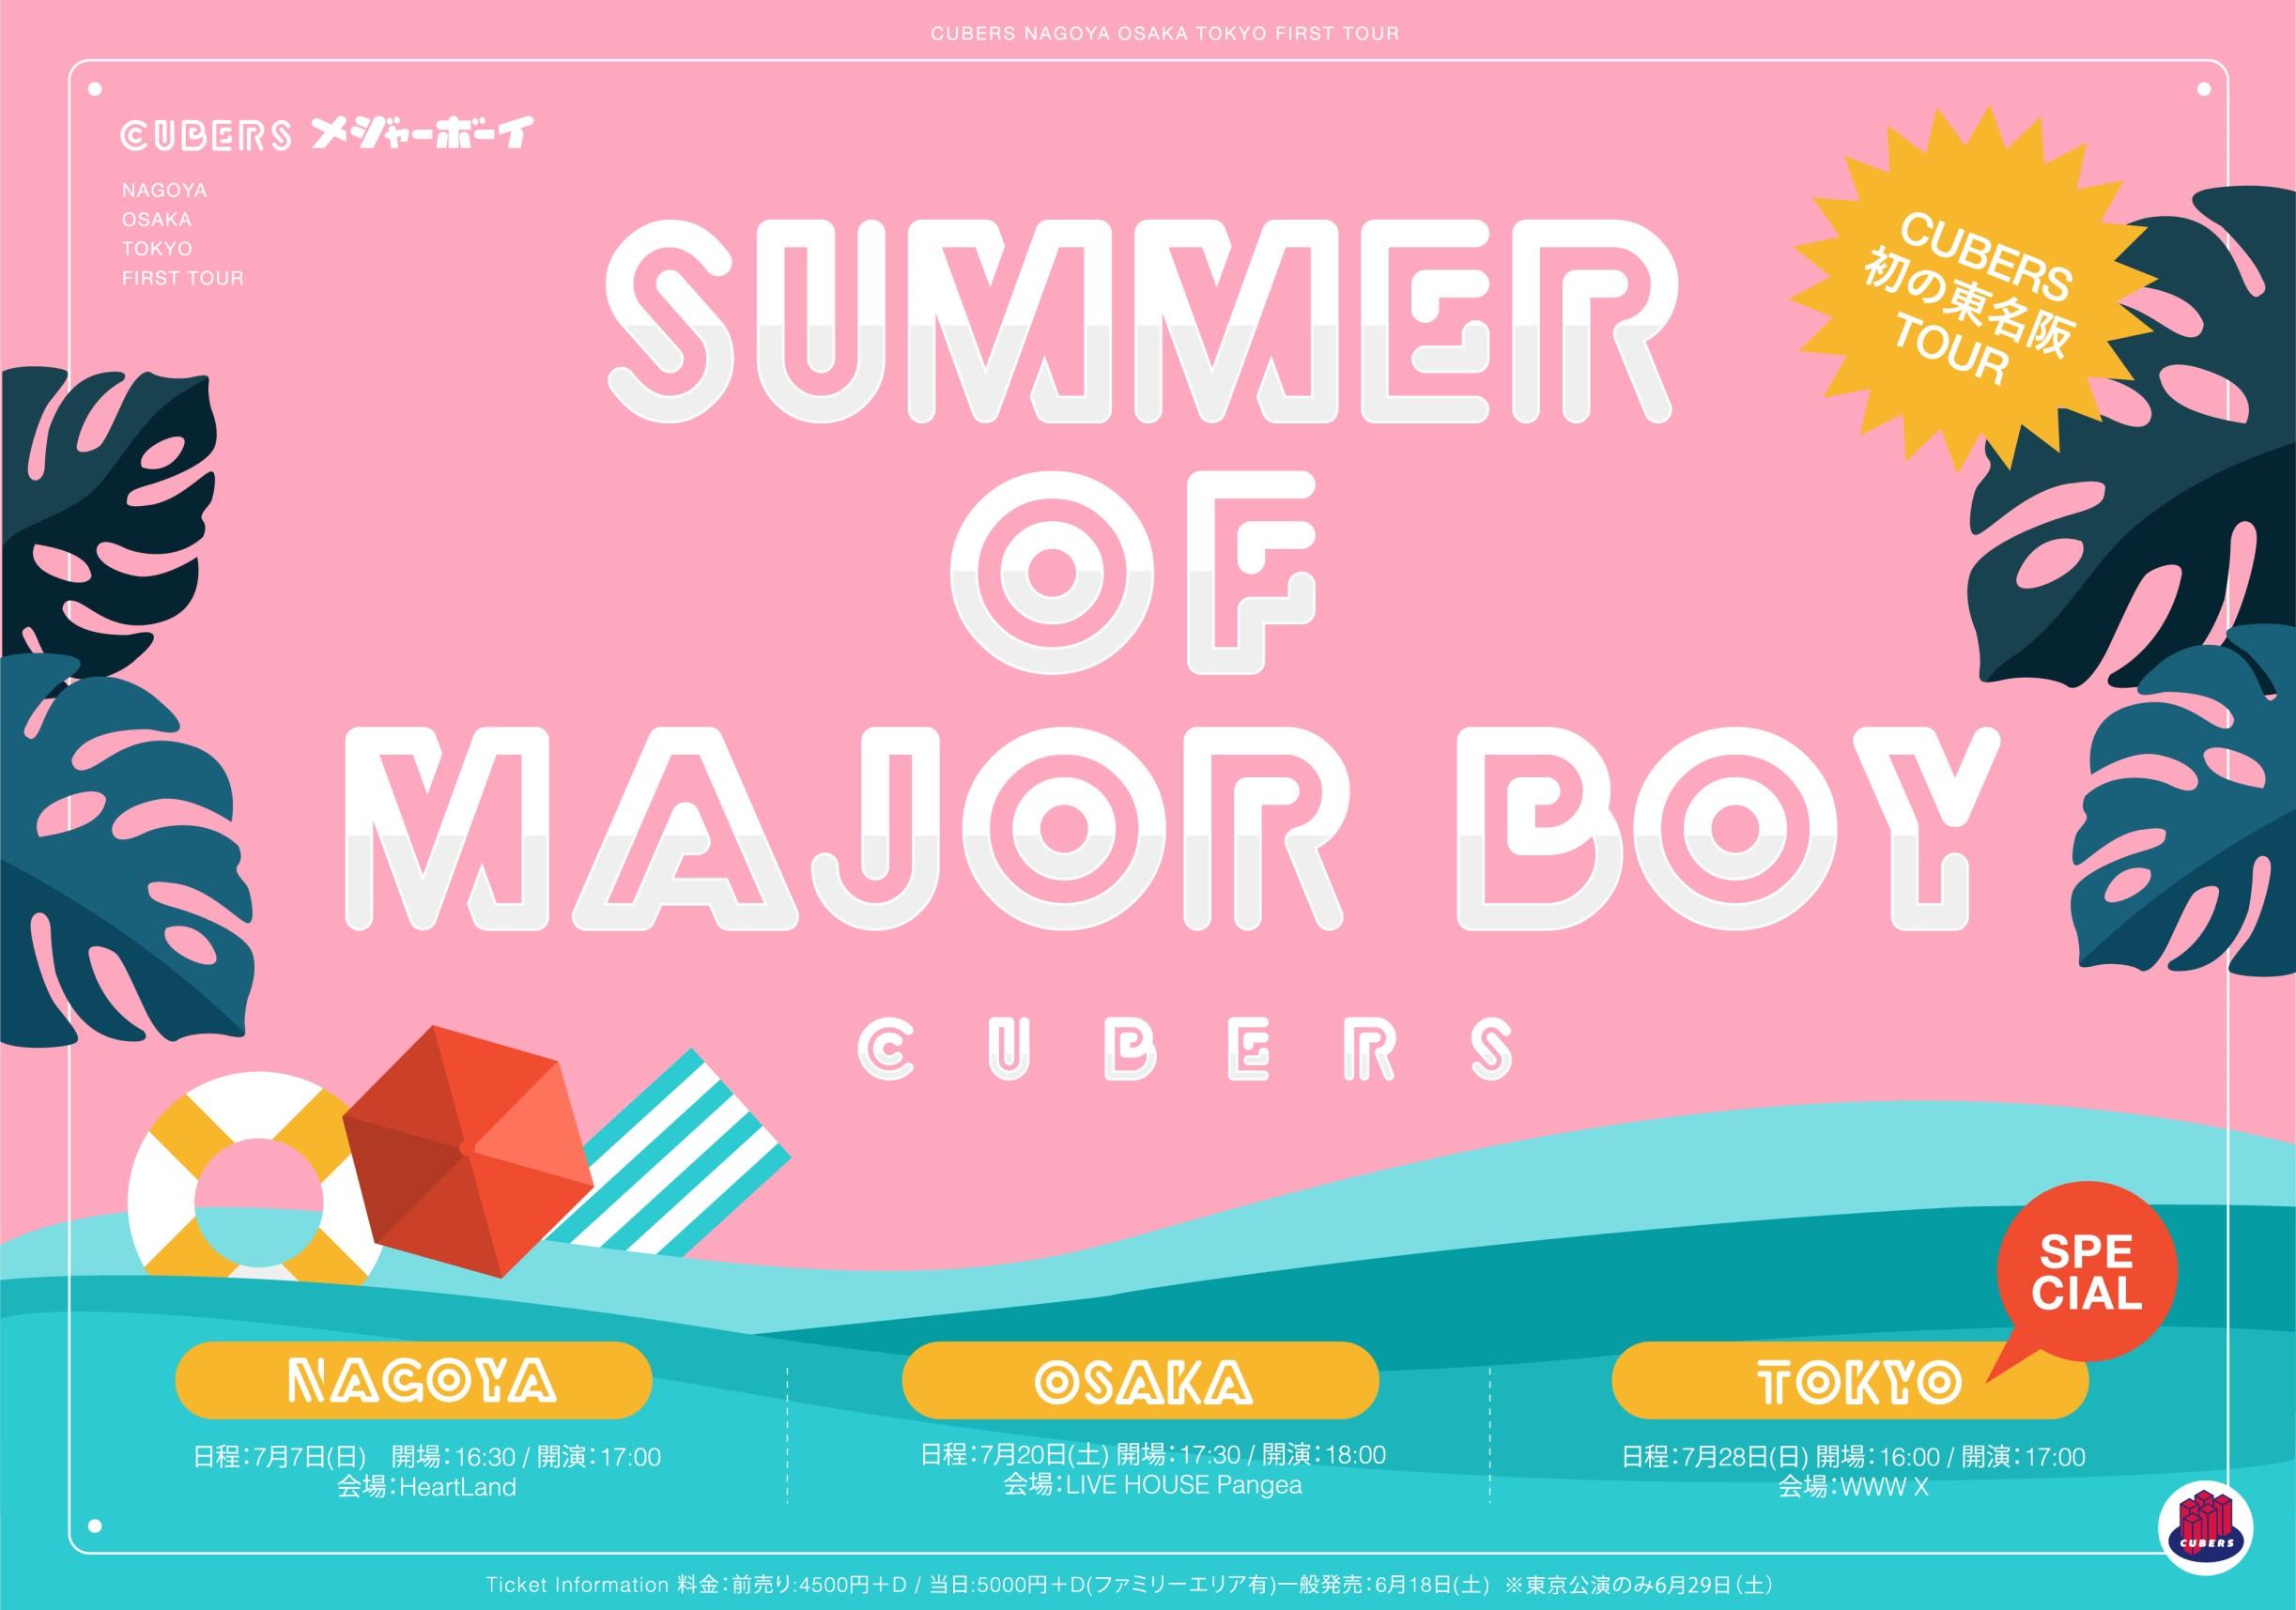 【NEWS】『CUBERS 初の東名阪TOUR〜SPECIAL SUMMER OF MAJOR BOY〜』プレイガイド先行について